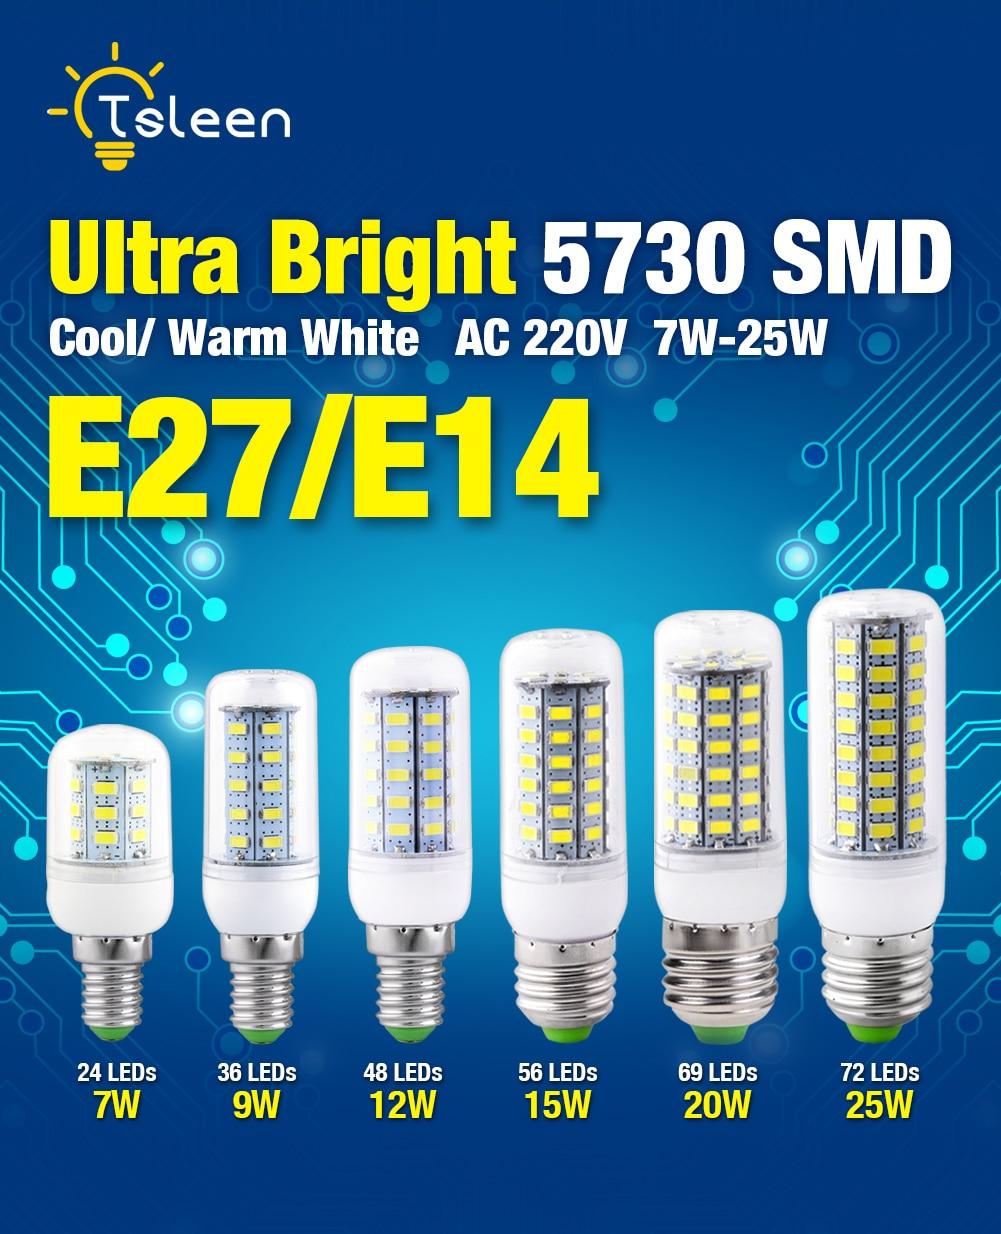 High Quality 220V 7W 9W 12W 15W 20W 25W 5730 SMD LED Corn Bulb Lamp Light Warm White Cool White Bulb E27 E14 Base For Home Decor